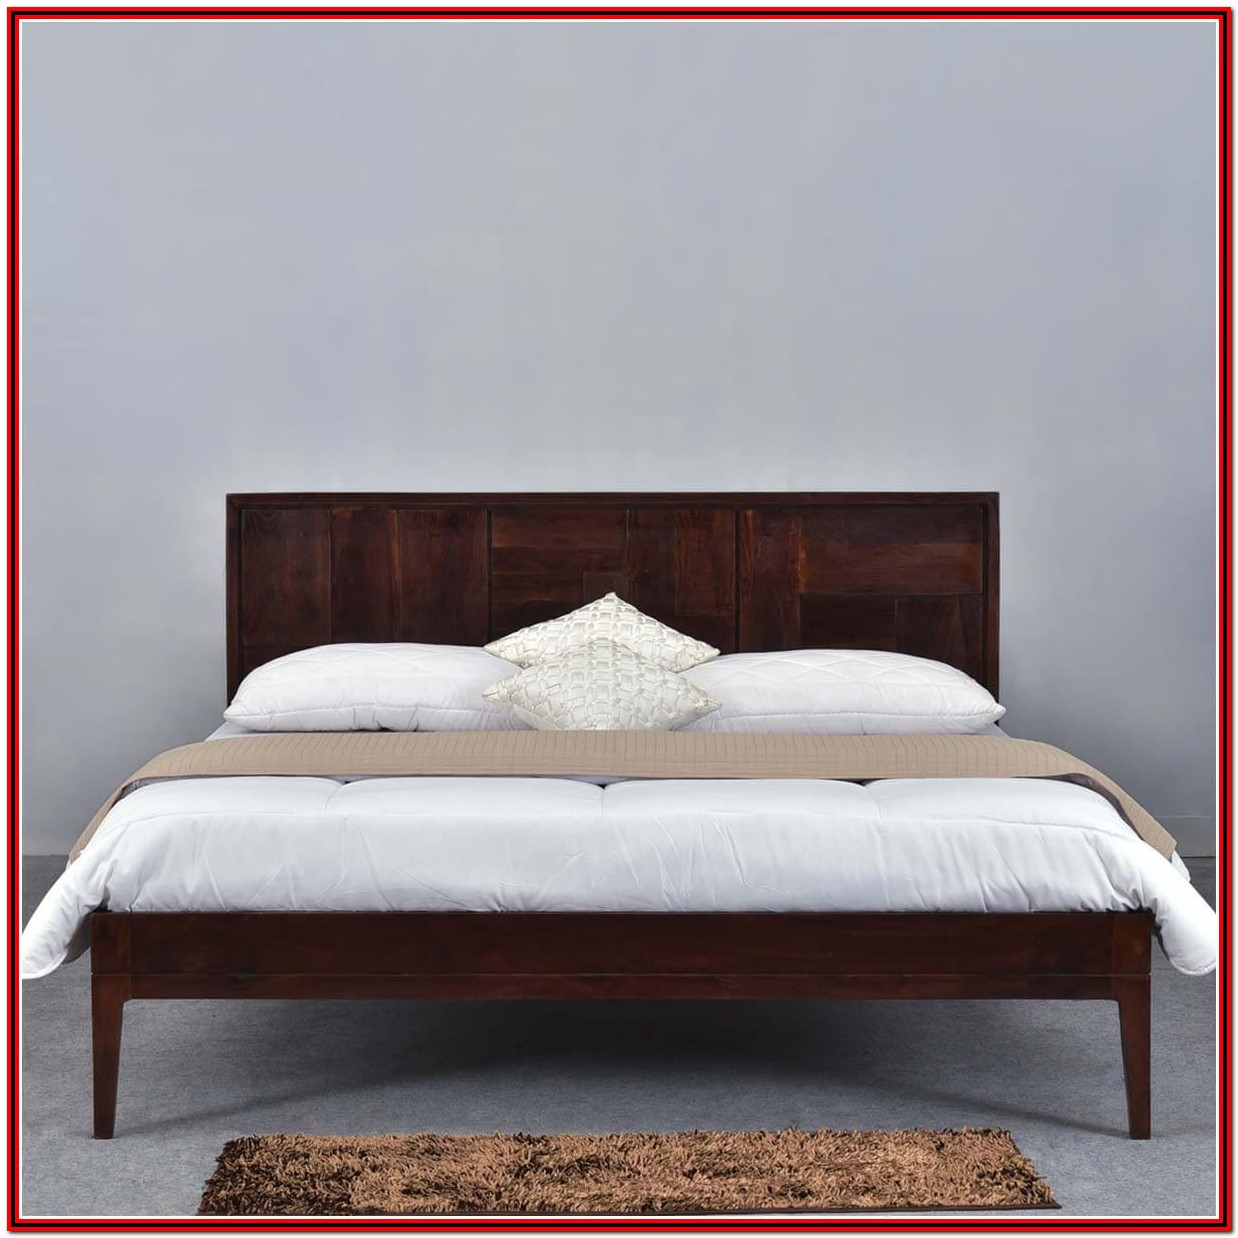 Wood Platform Bed Frame With Headboard King